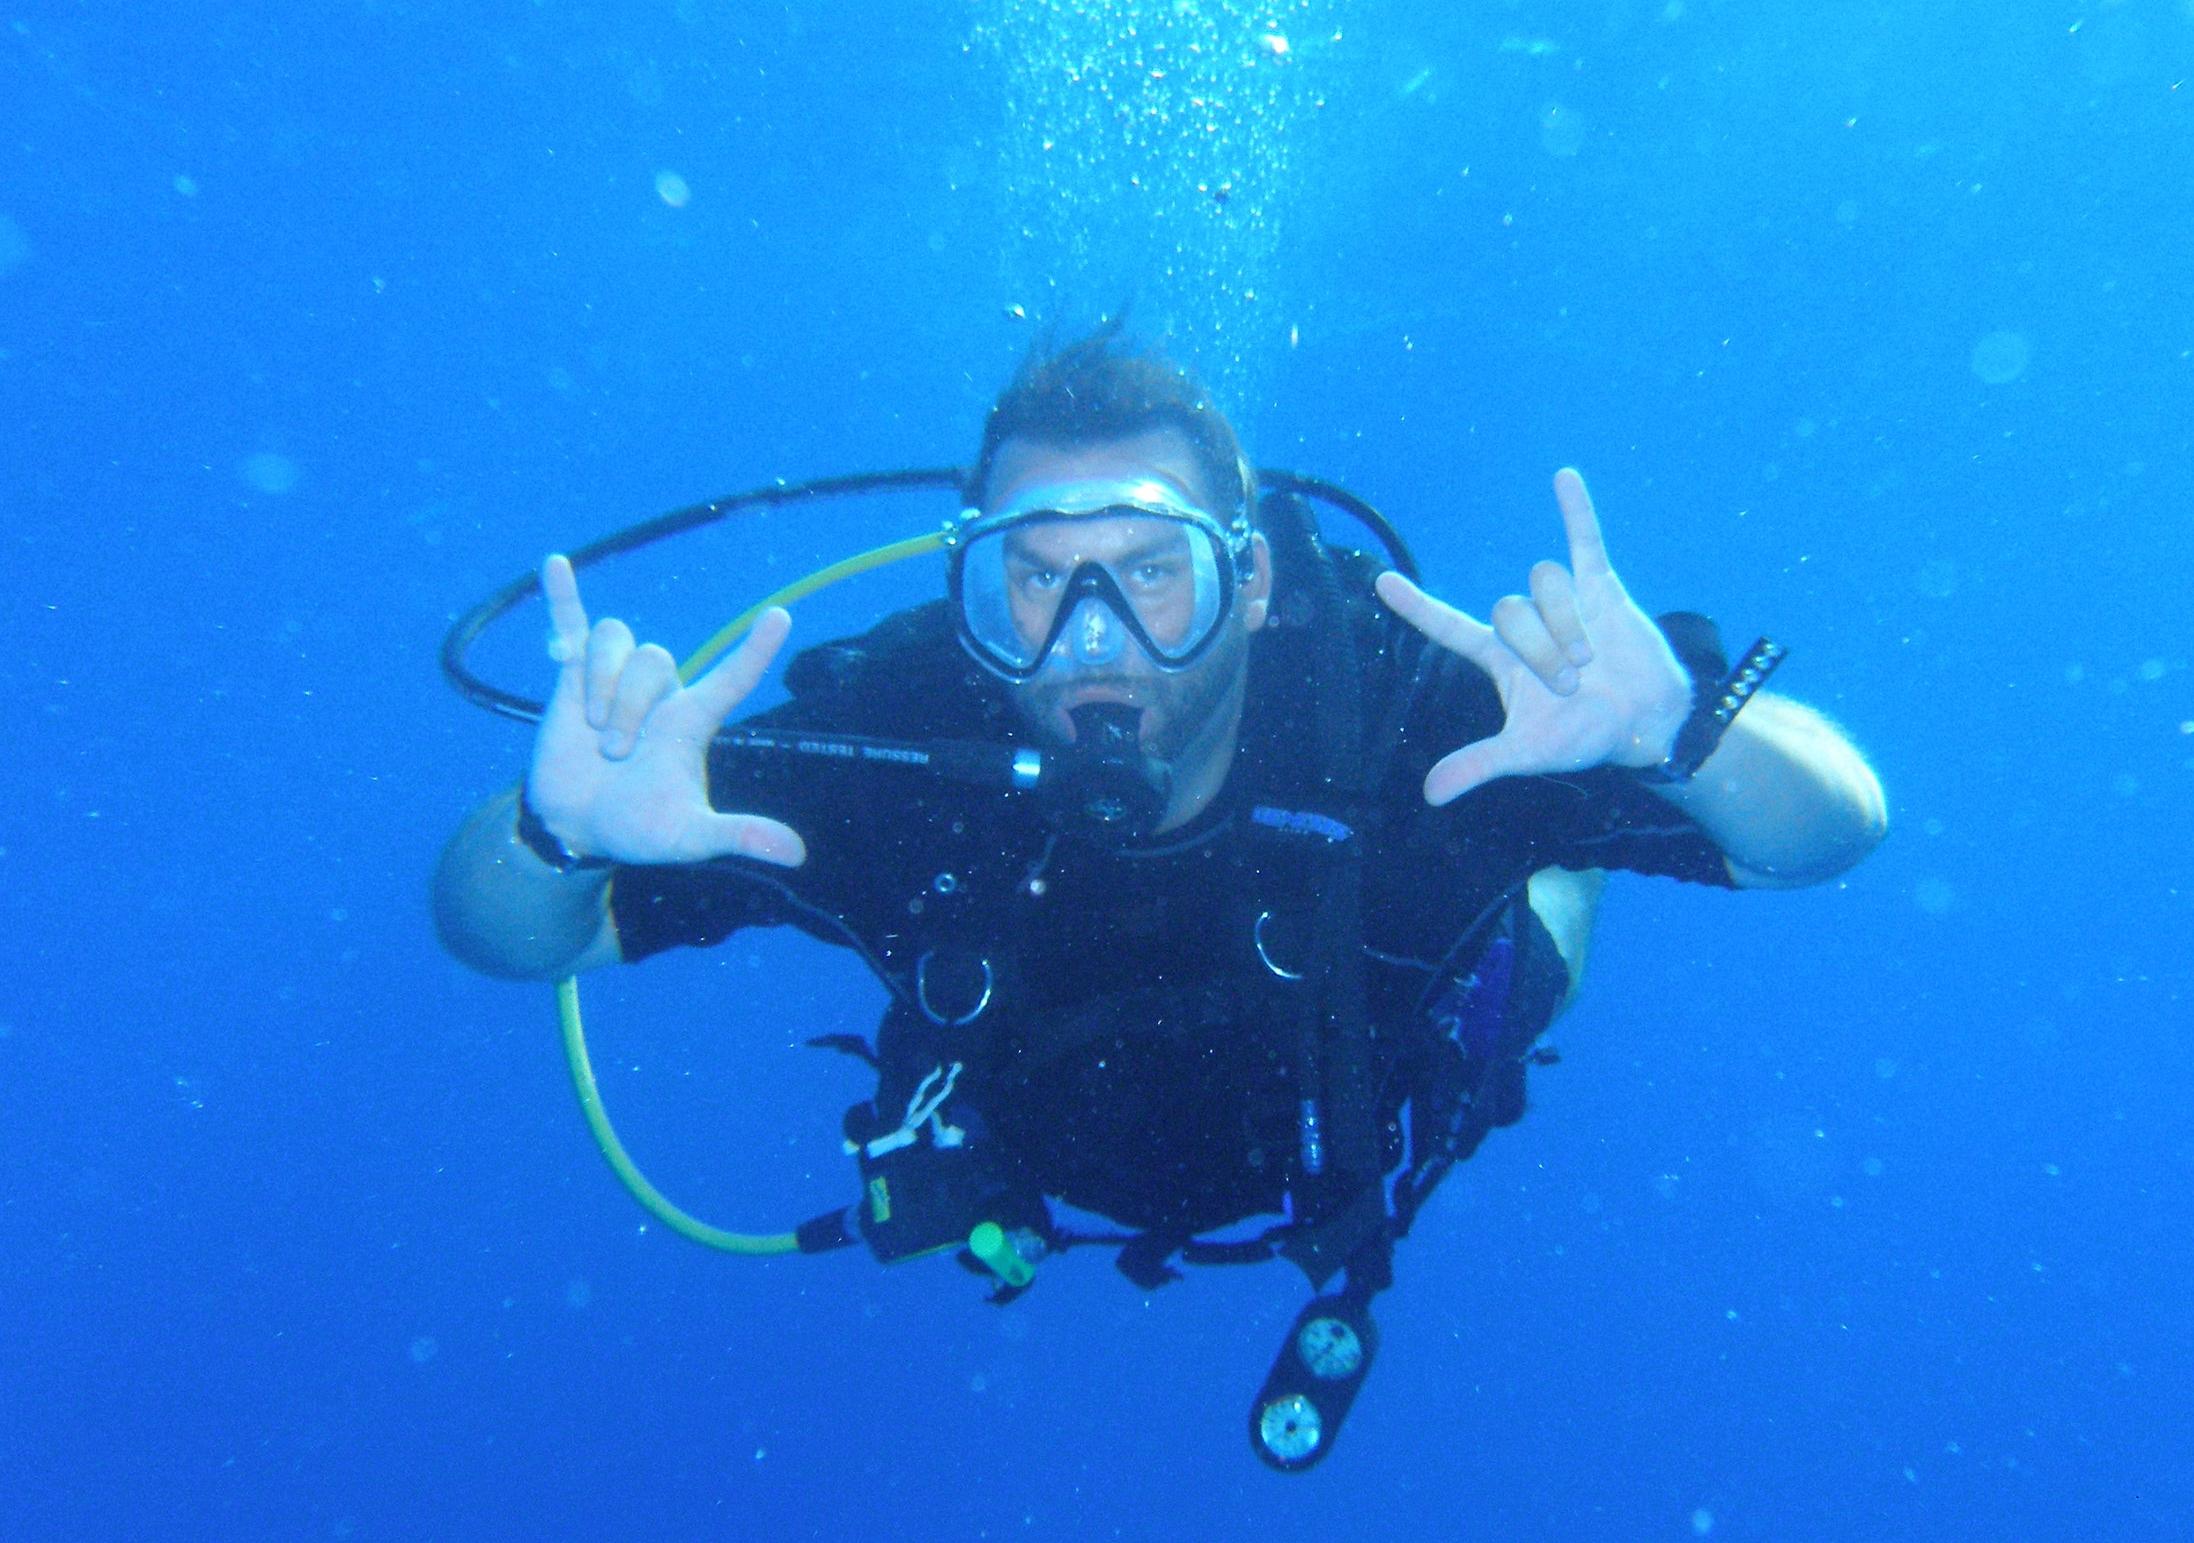 50 feet underwater. My happy place.